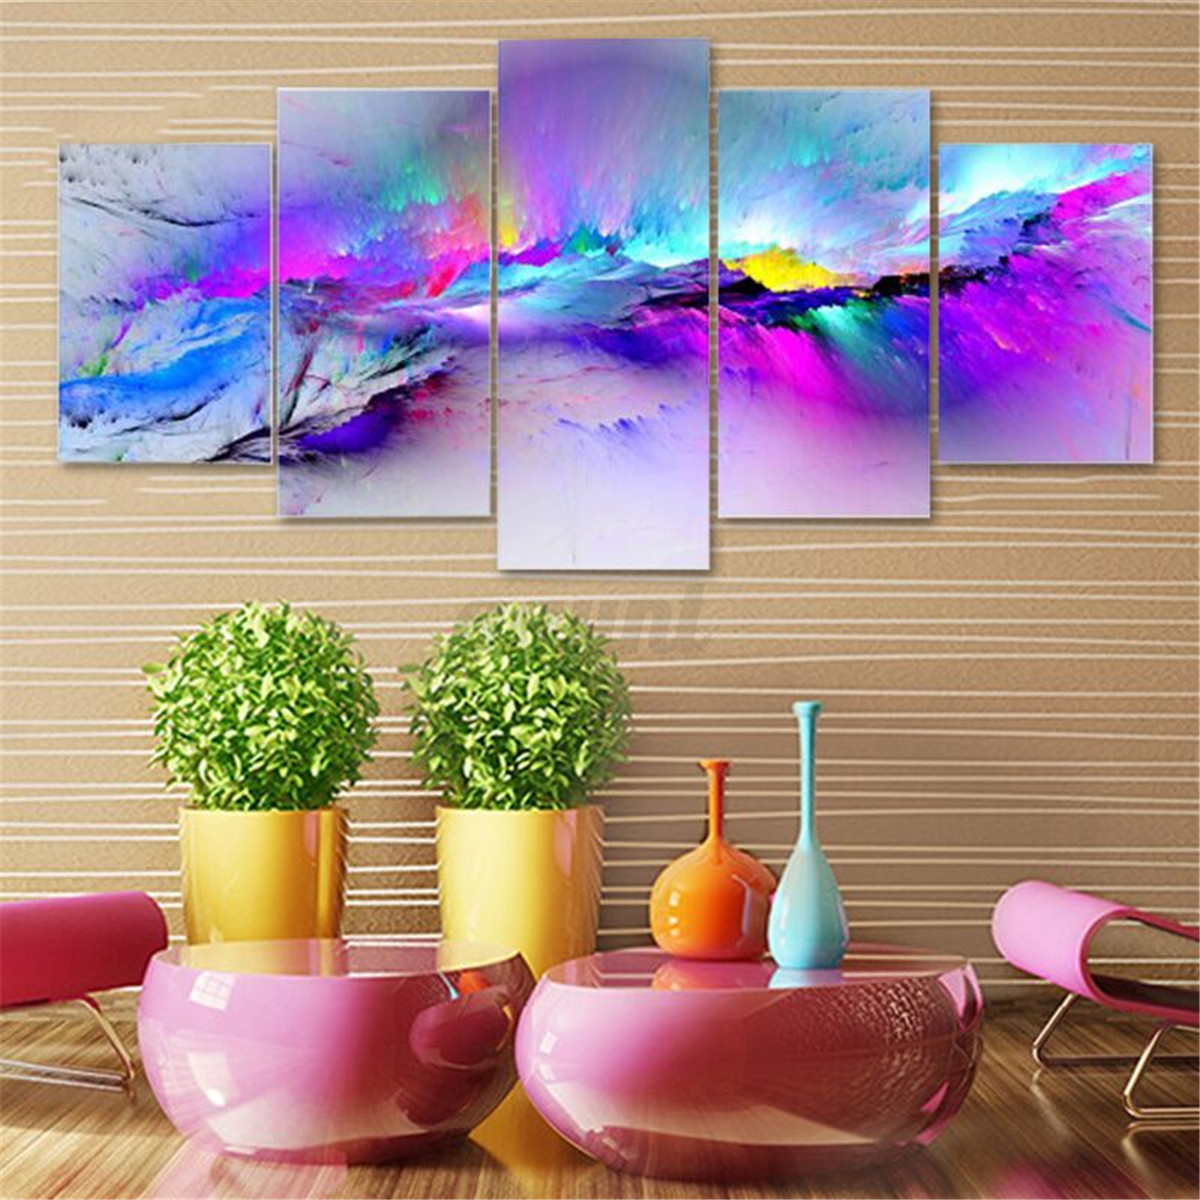 Konda Art Framed Handmade Purple Flower Oil Painting On: Modern Abstract Tree Flowers Poster Art Canvas Prints